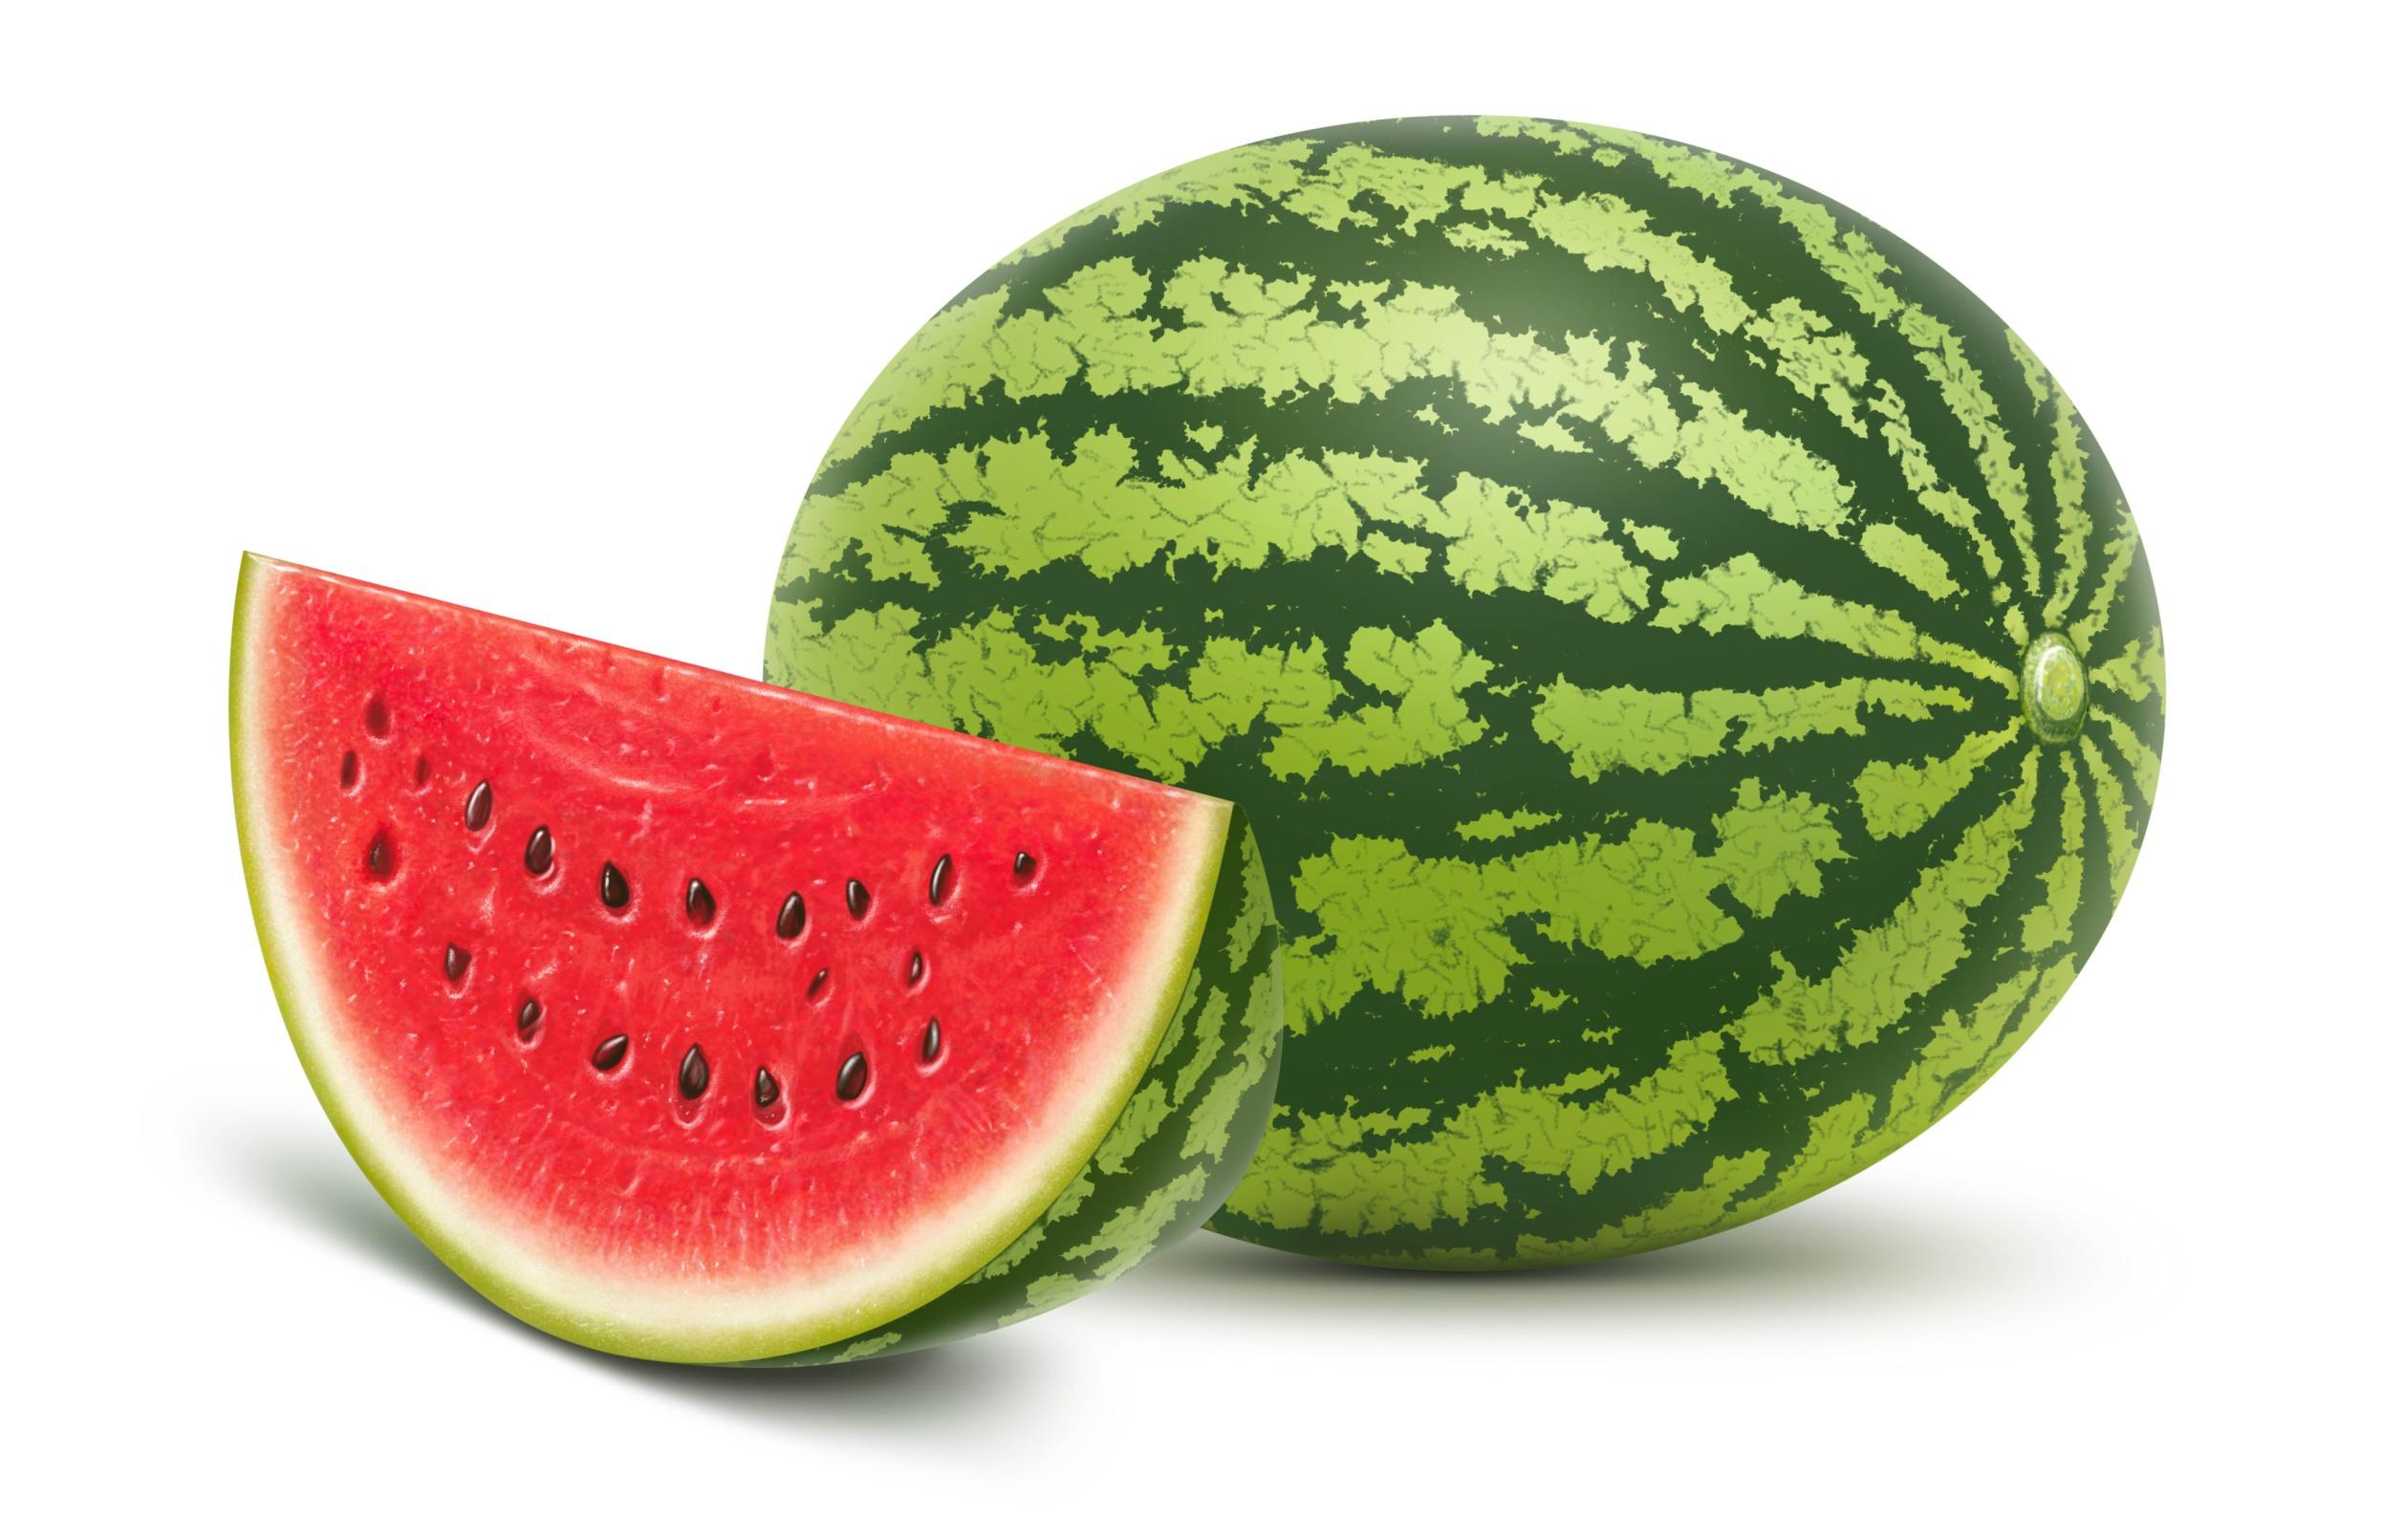 http://www.fotokanal.com/images/36/watermelon-4.jpg